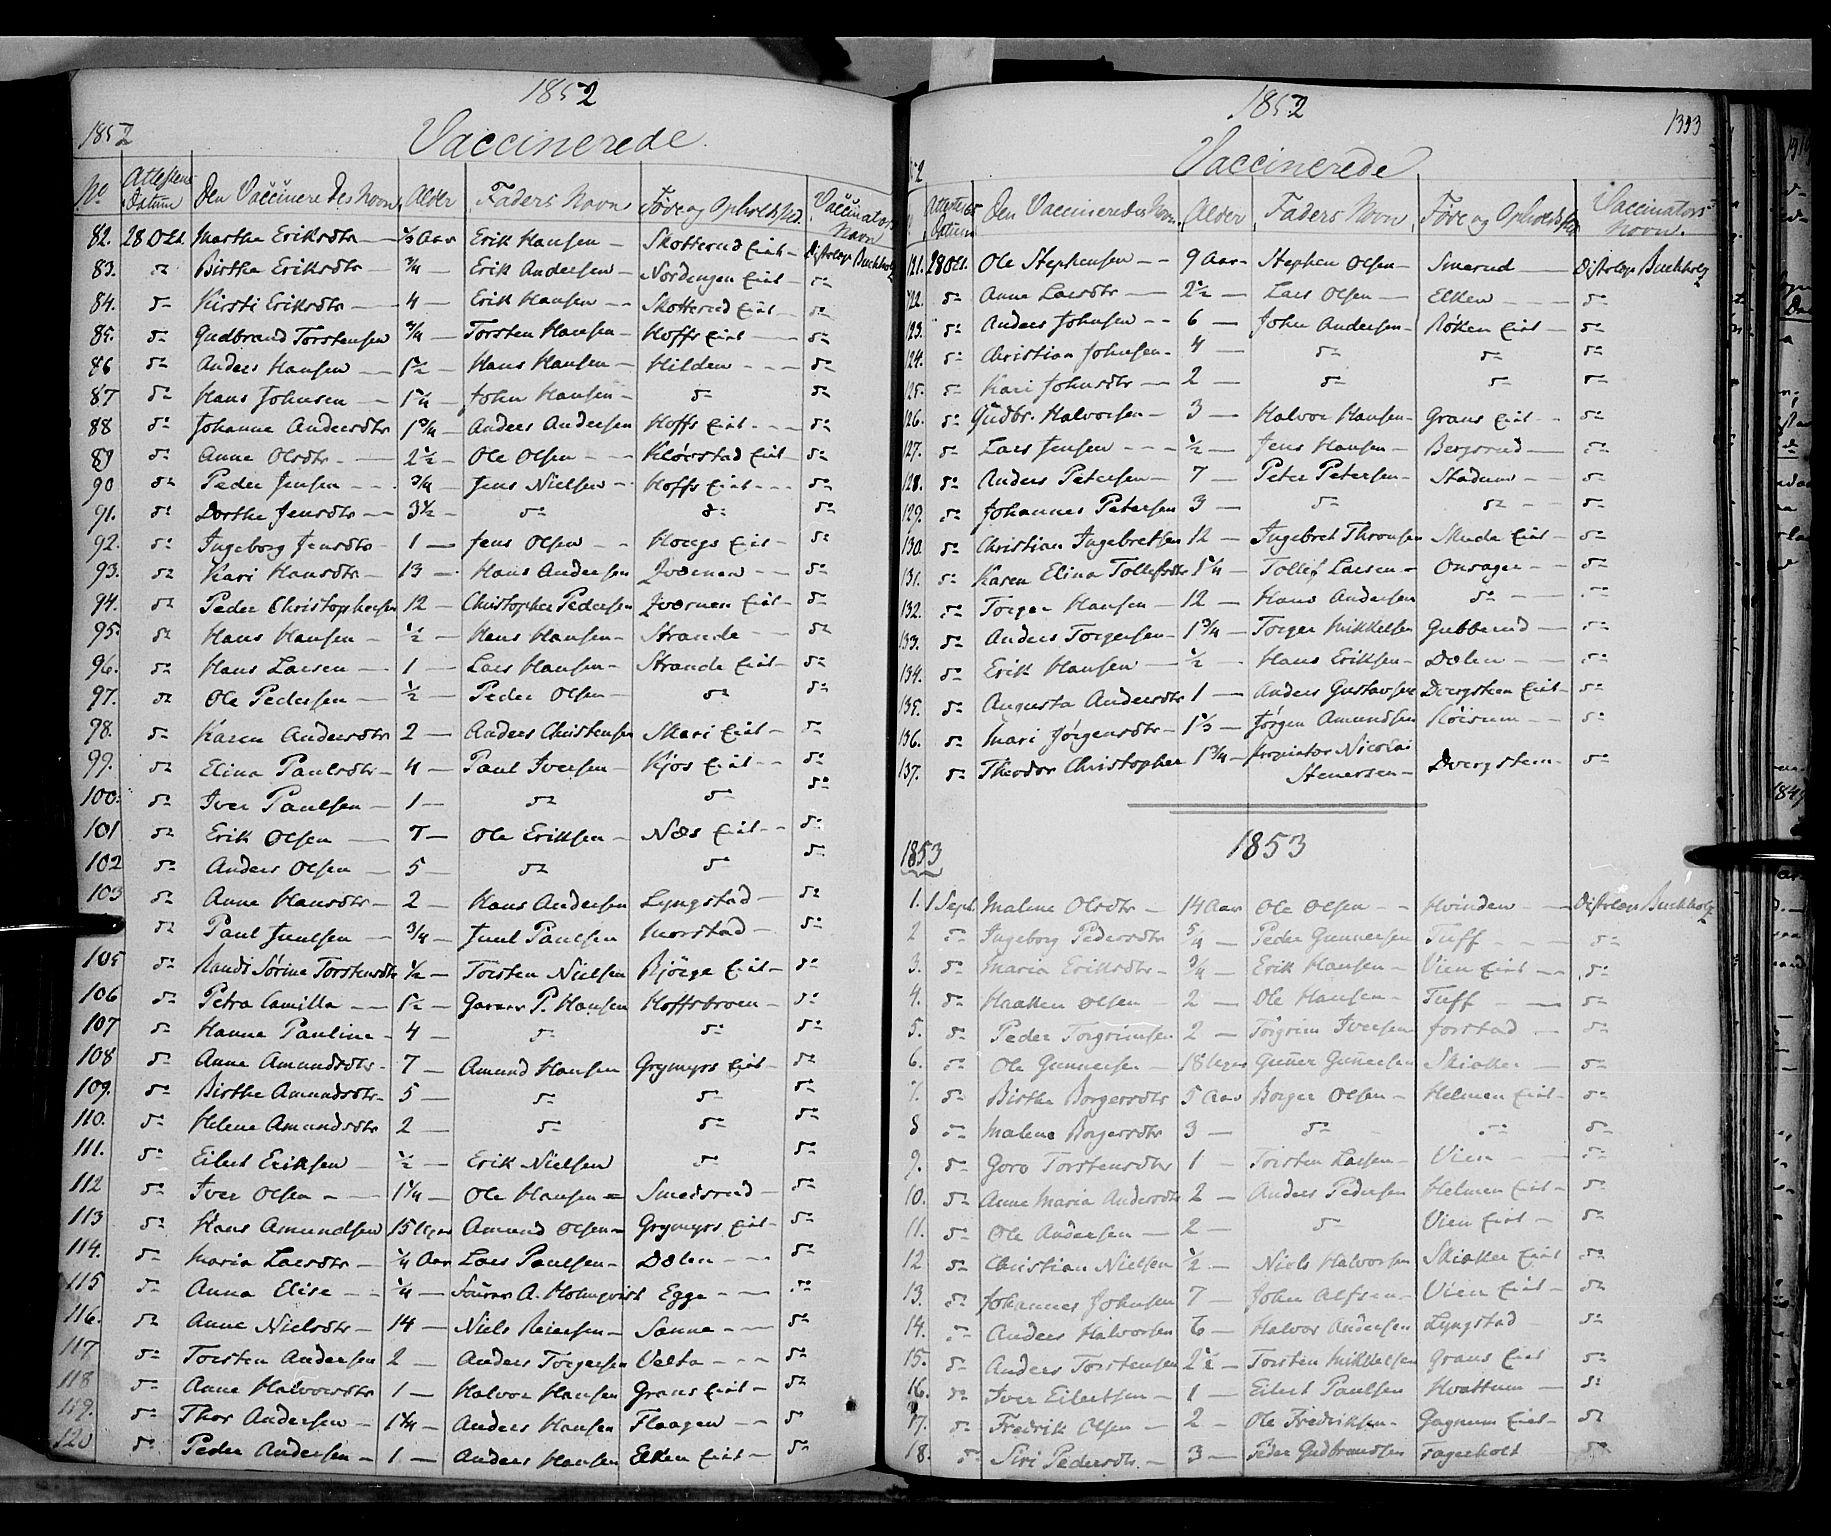 SAH, Gran prestekontor, Ministerialbok nr. 11, 1842-1856, s. 1342-1343